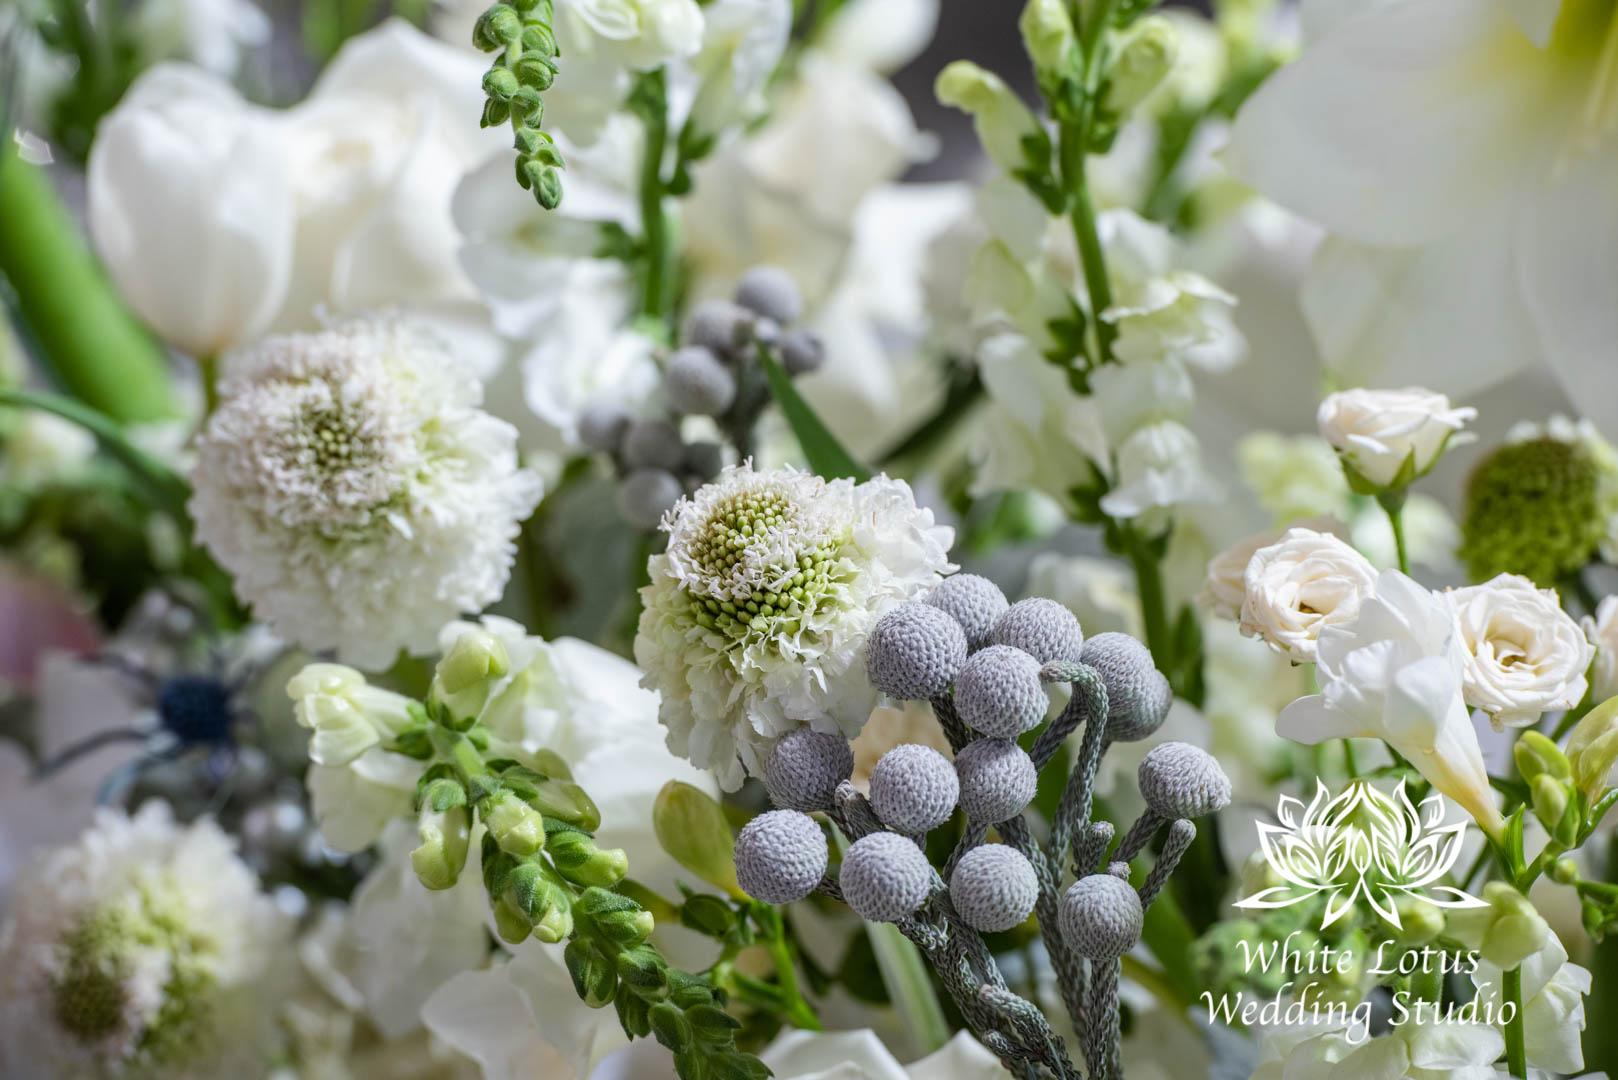 032- GLAM WINTERLUXE WEDDING INSPIRATION